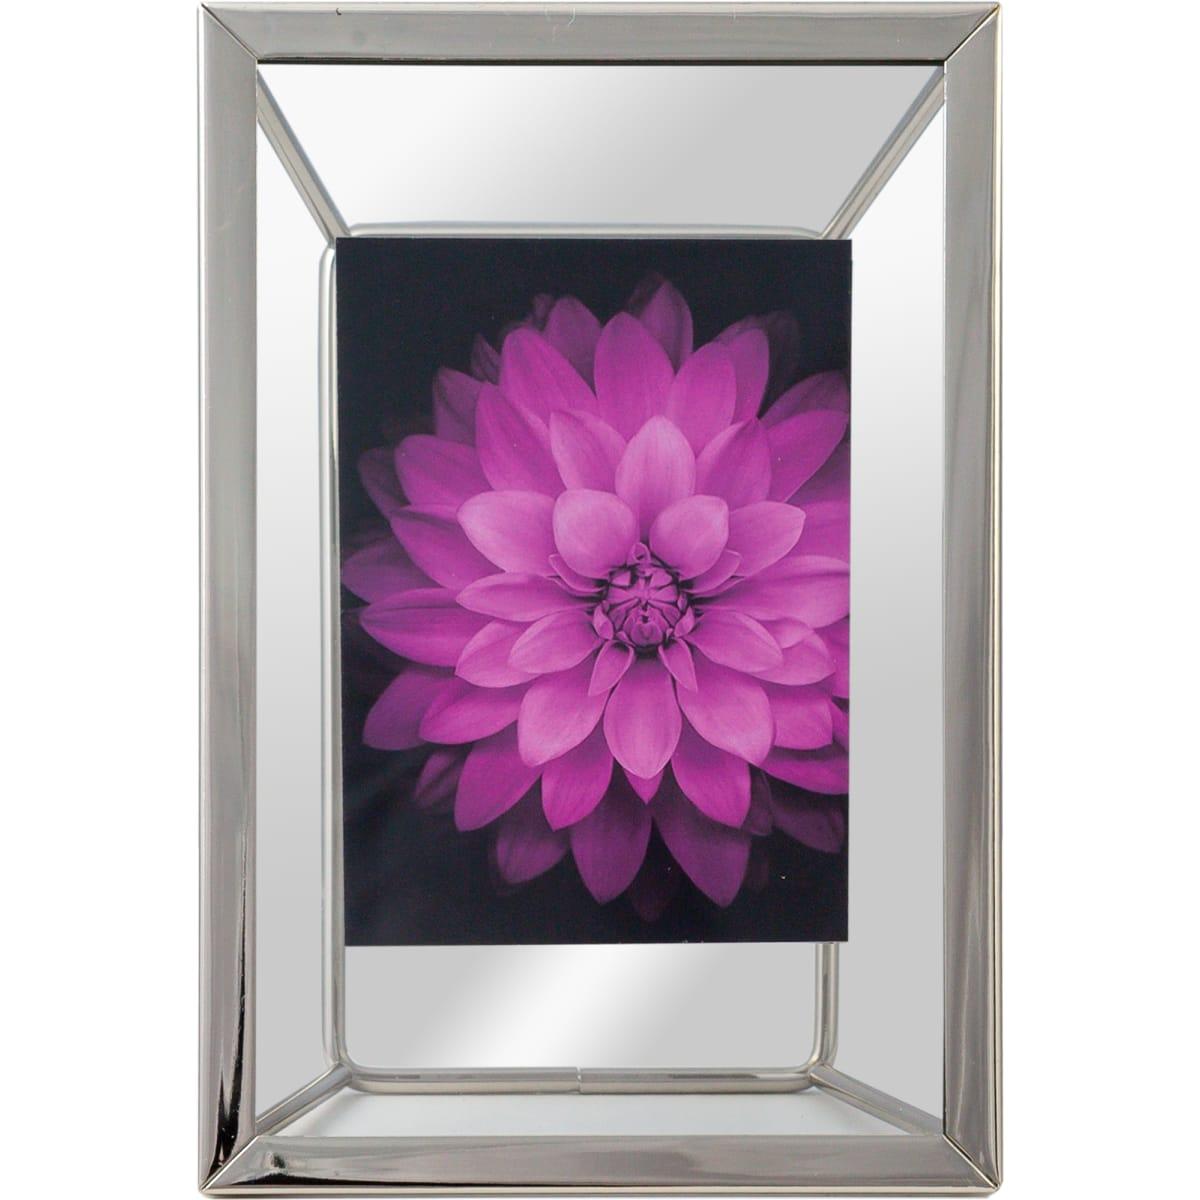 Рамка 10x15 см, цвет серебристый